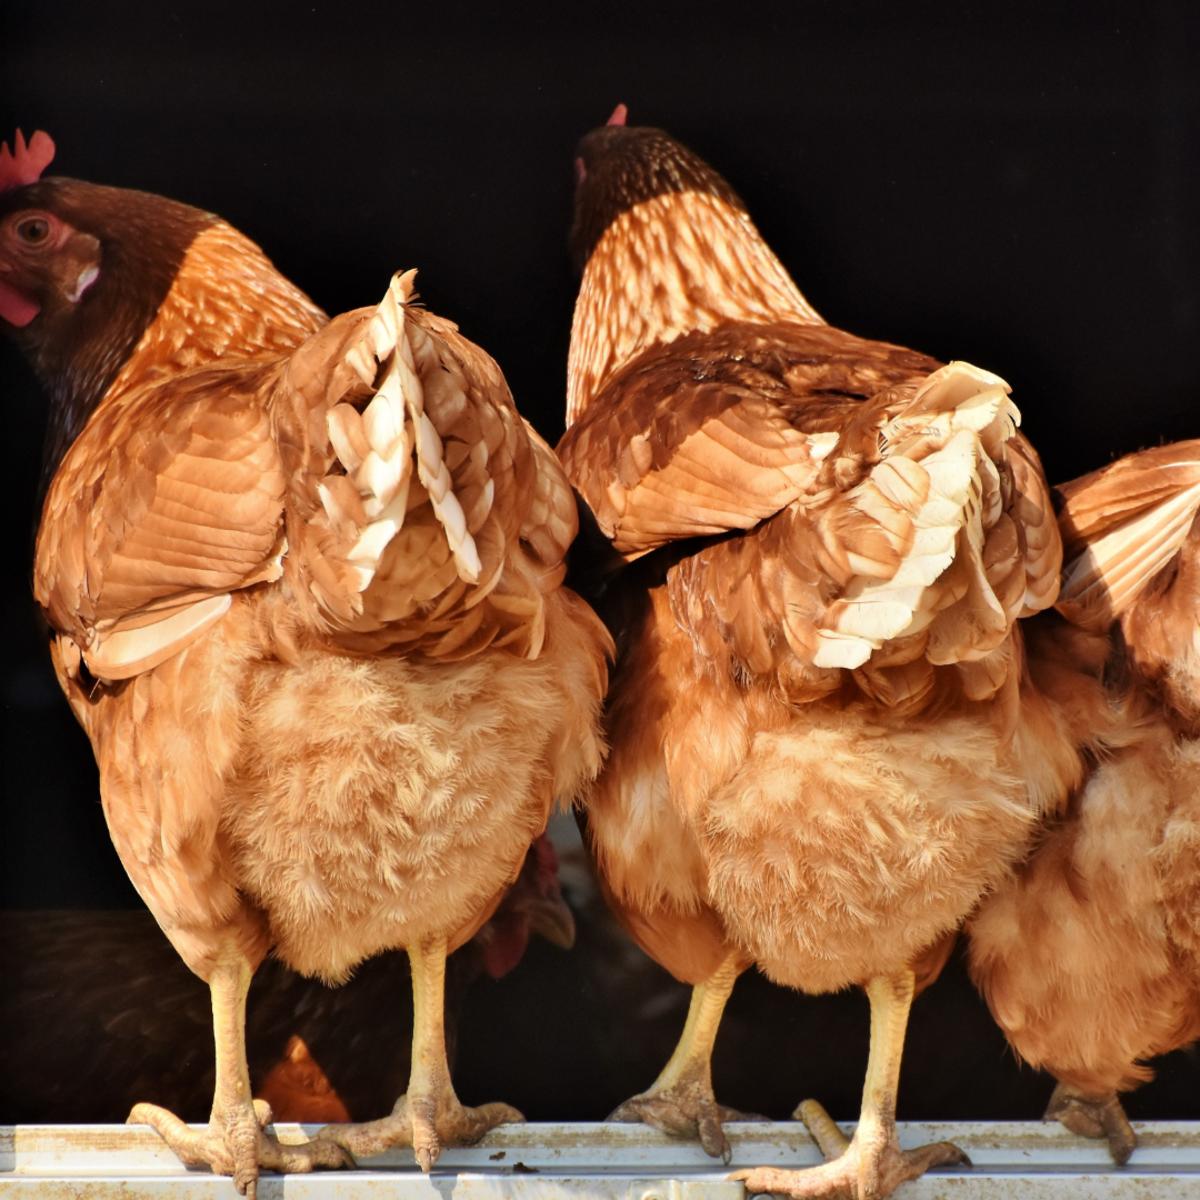 Reintroduce your chicken slowly.